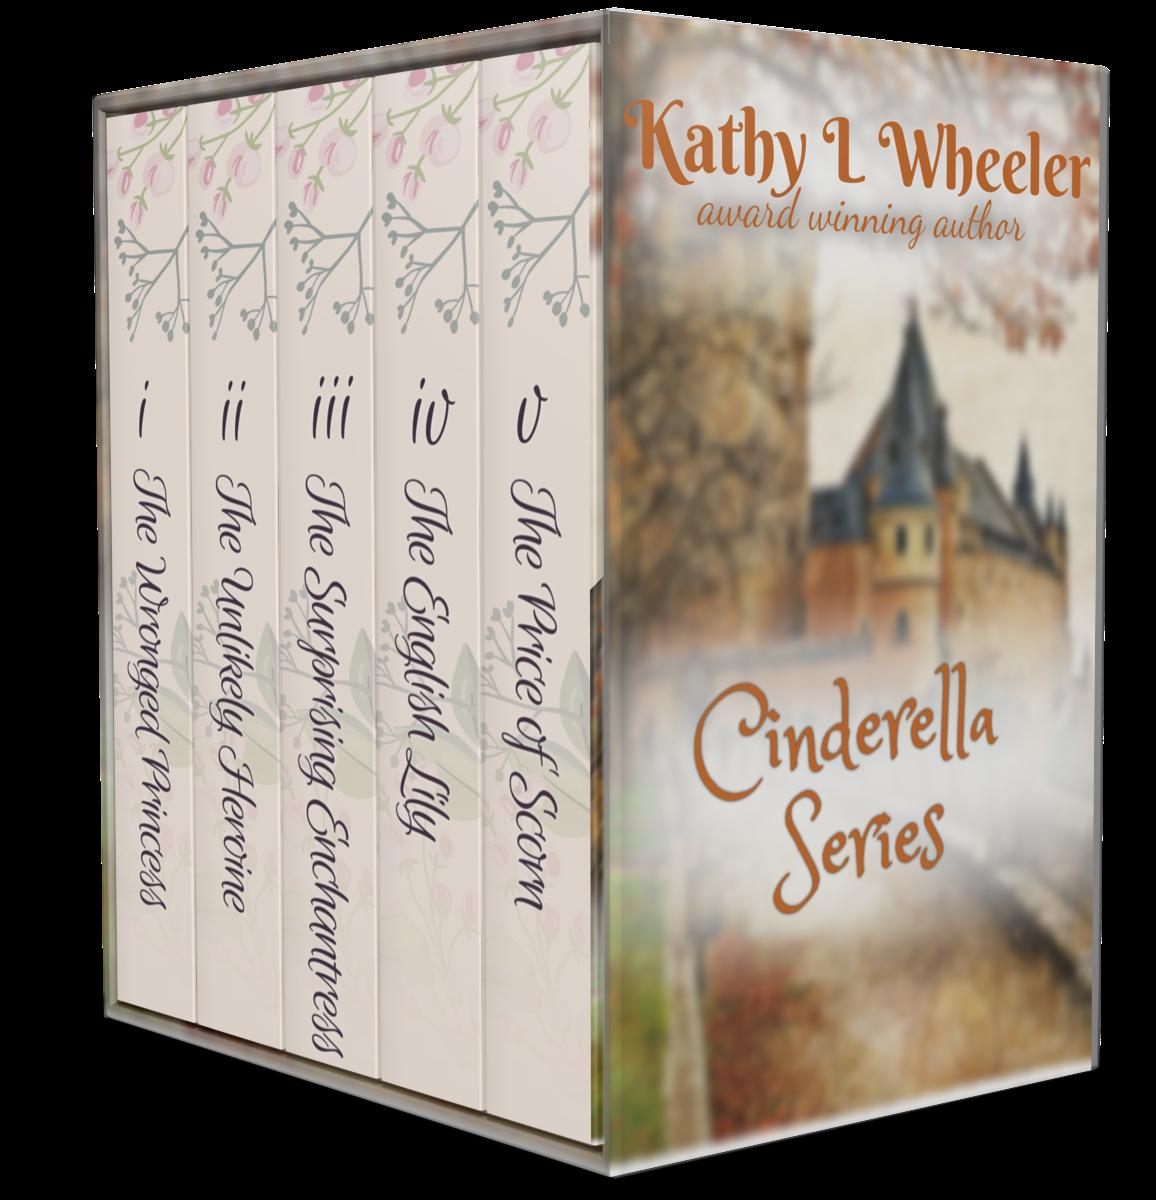 Cinderella Series